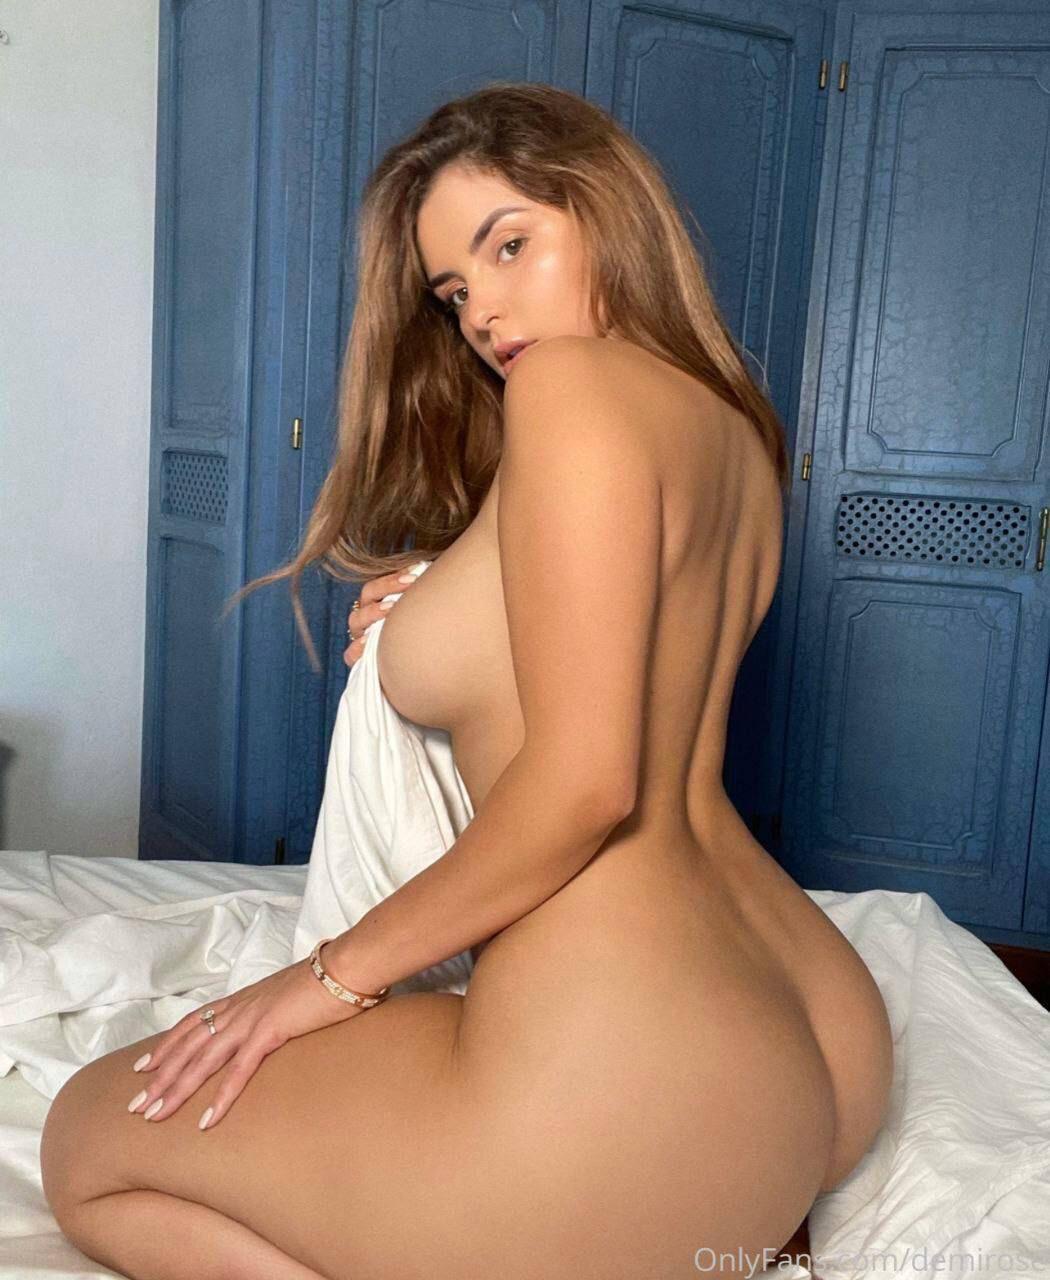 Demi Rose Mawby Naked Body